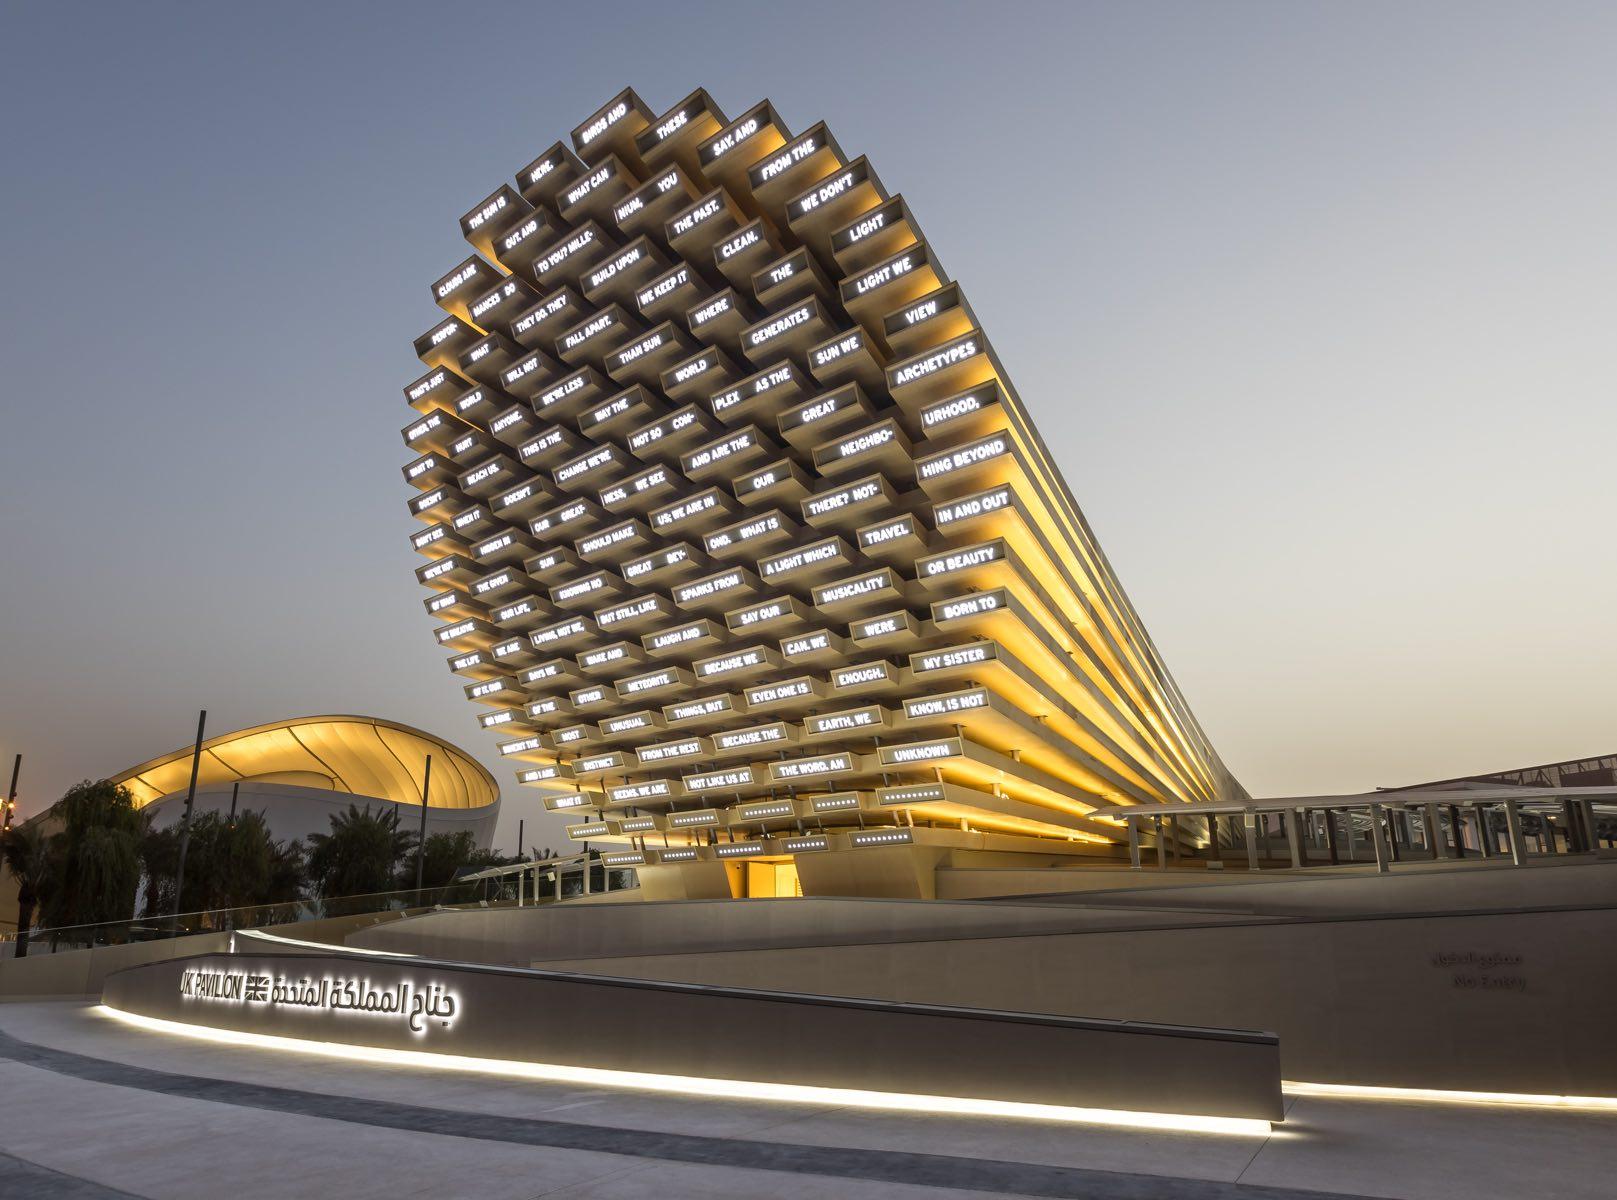 Avantgarde verantwortet UK Pavillon auf EXPO Dubai